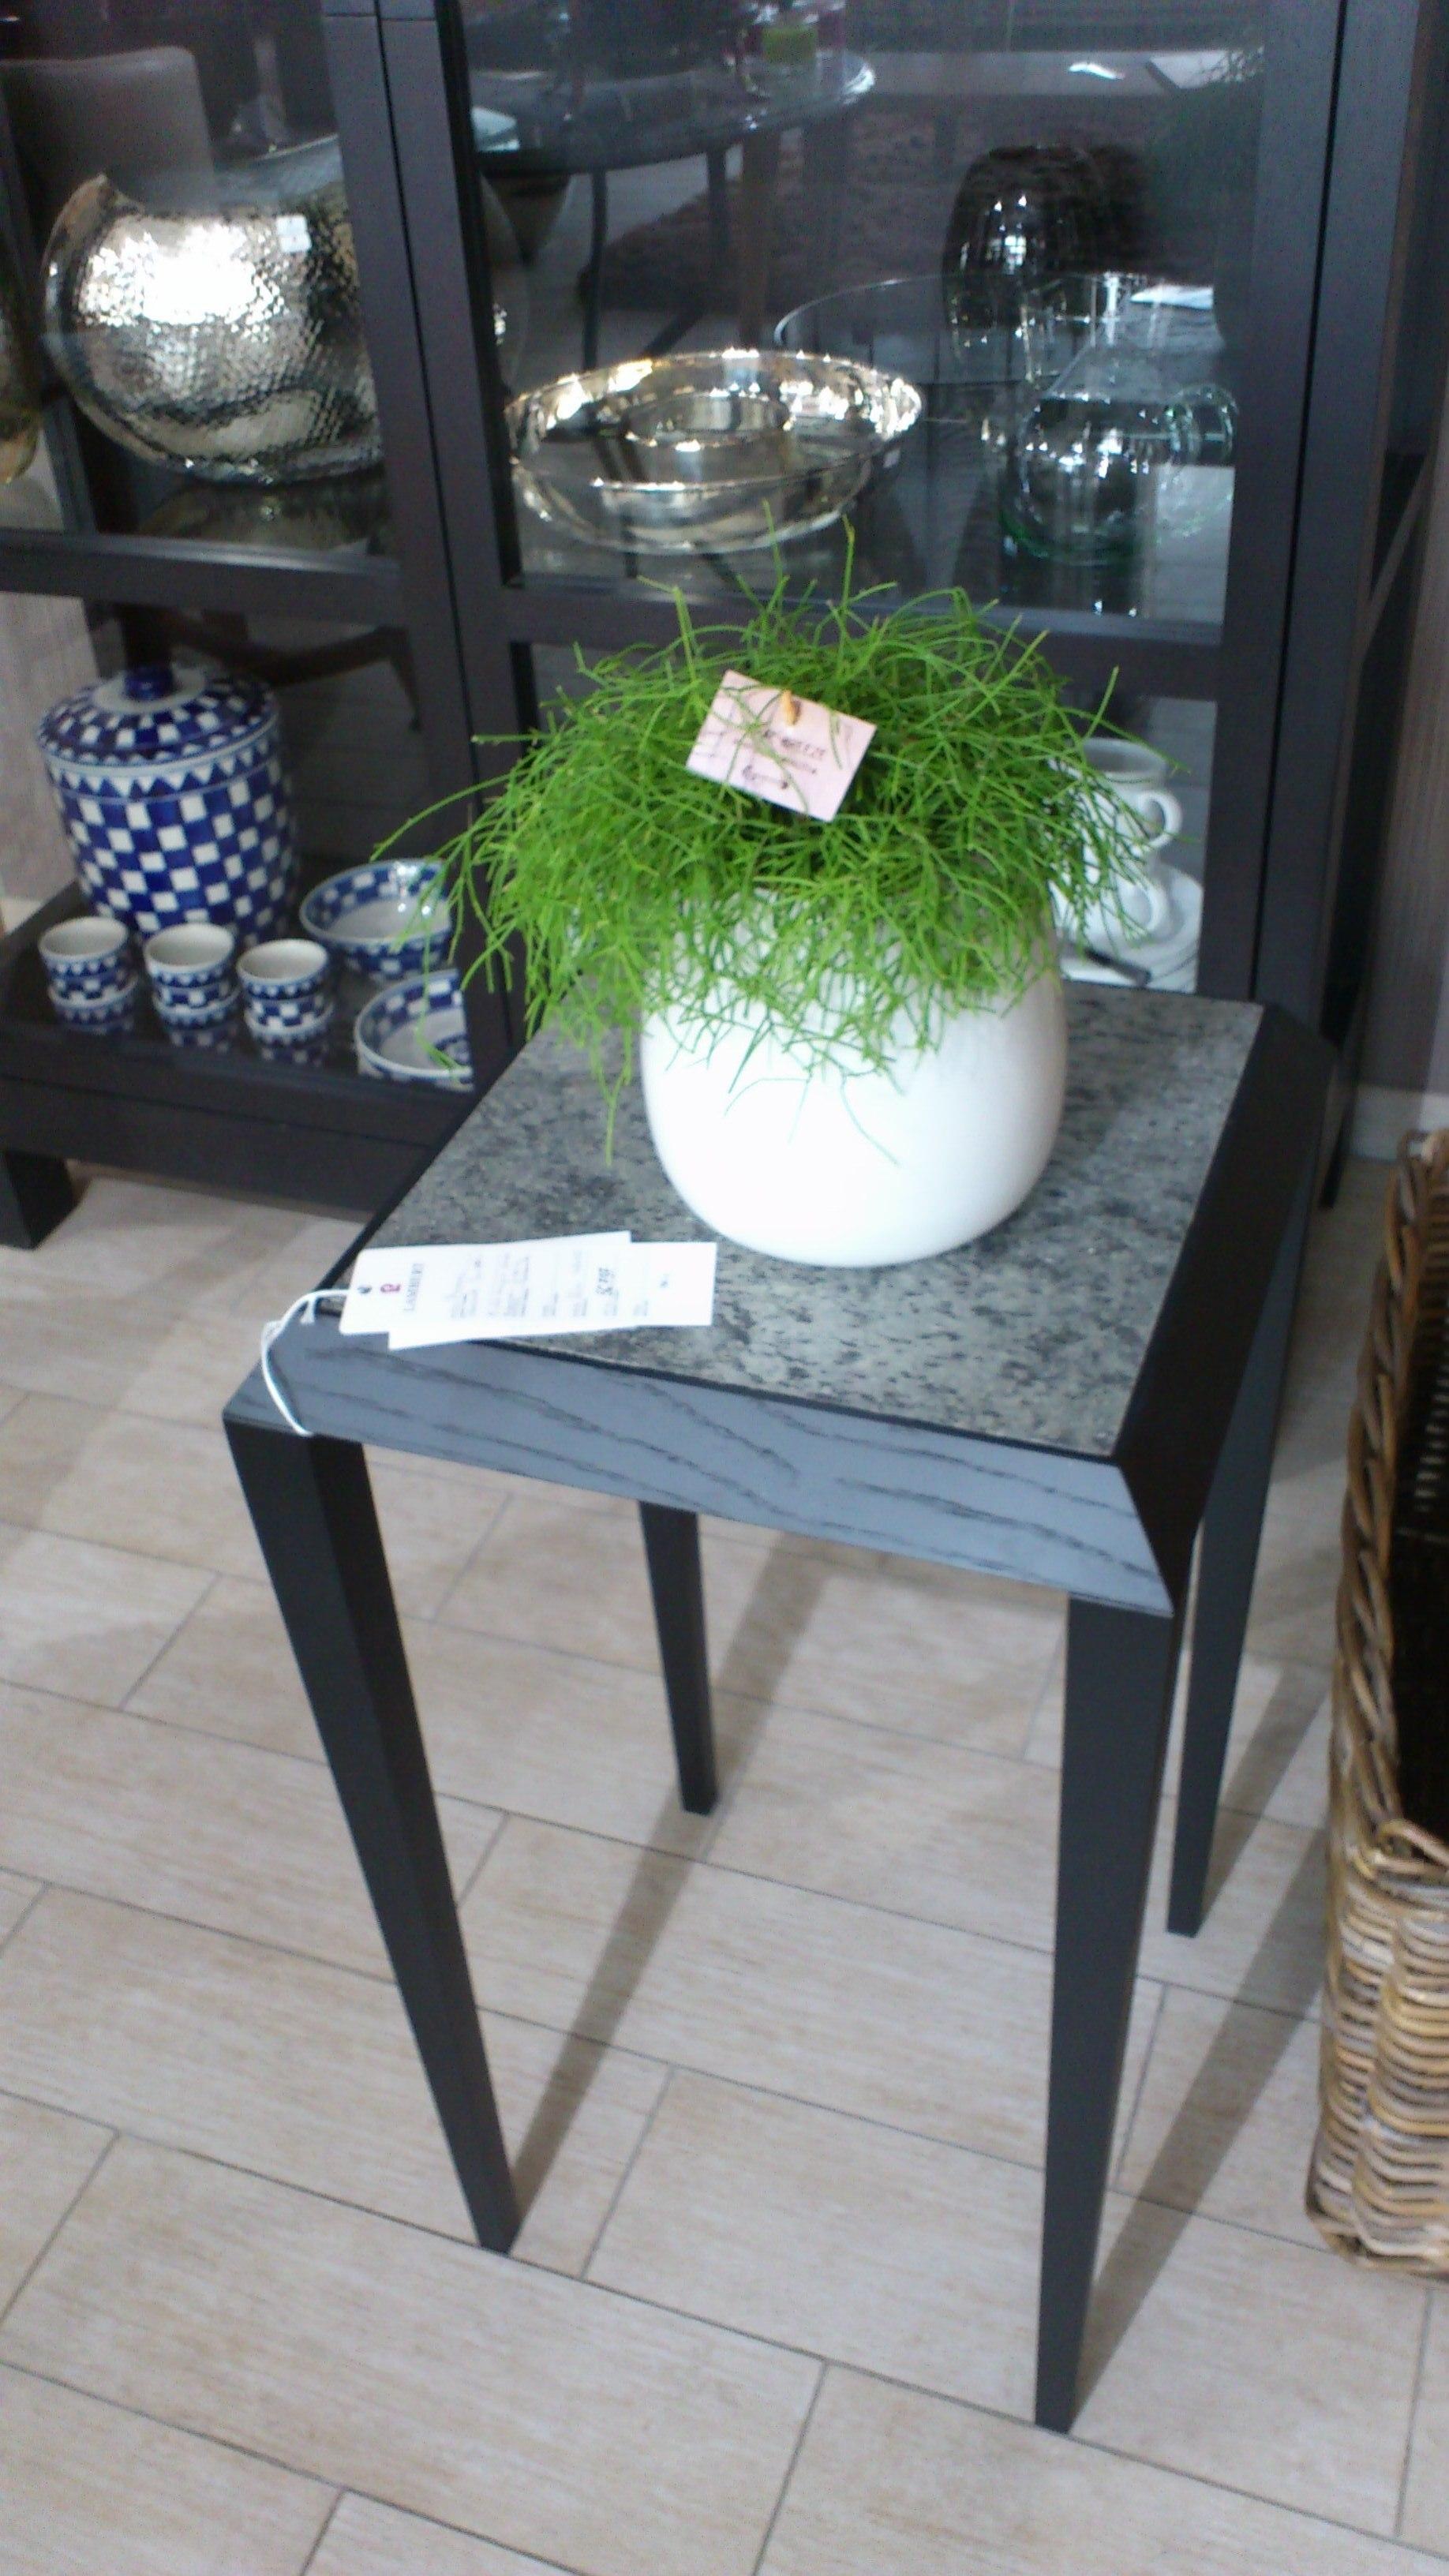 lambert exklusive m bel und accessoires wohnbar bad salzungen m bel accessoires u v m. Black Bedroom Furniture Sets. Home Design Ideas